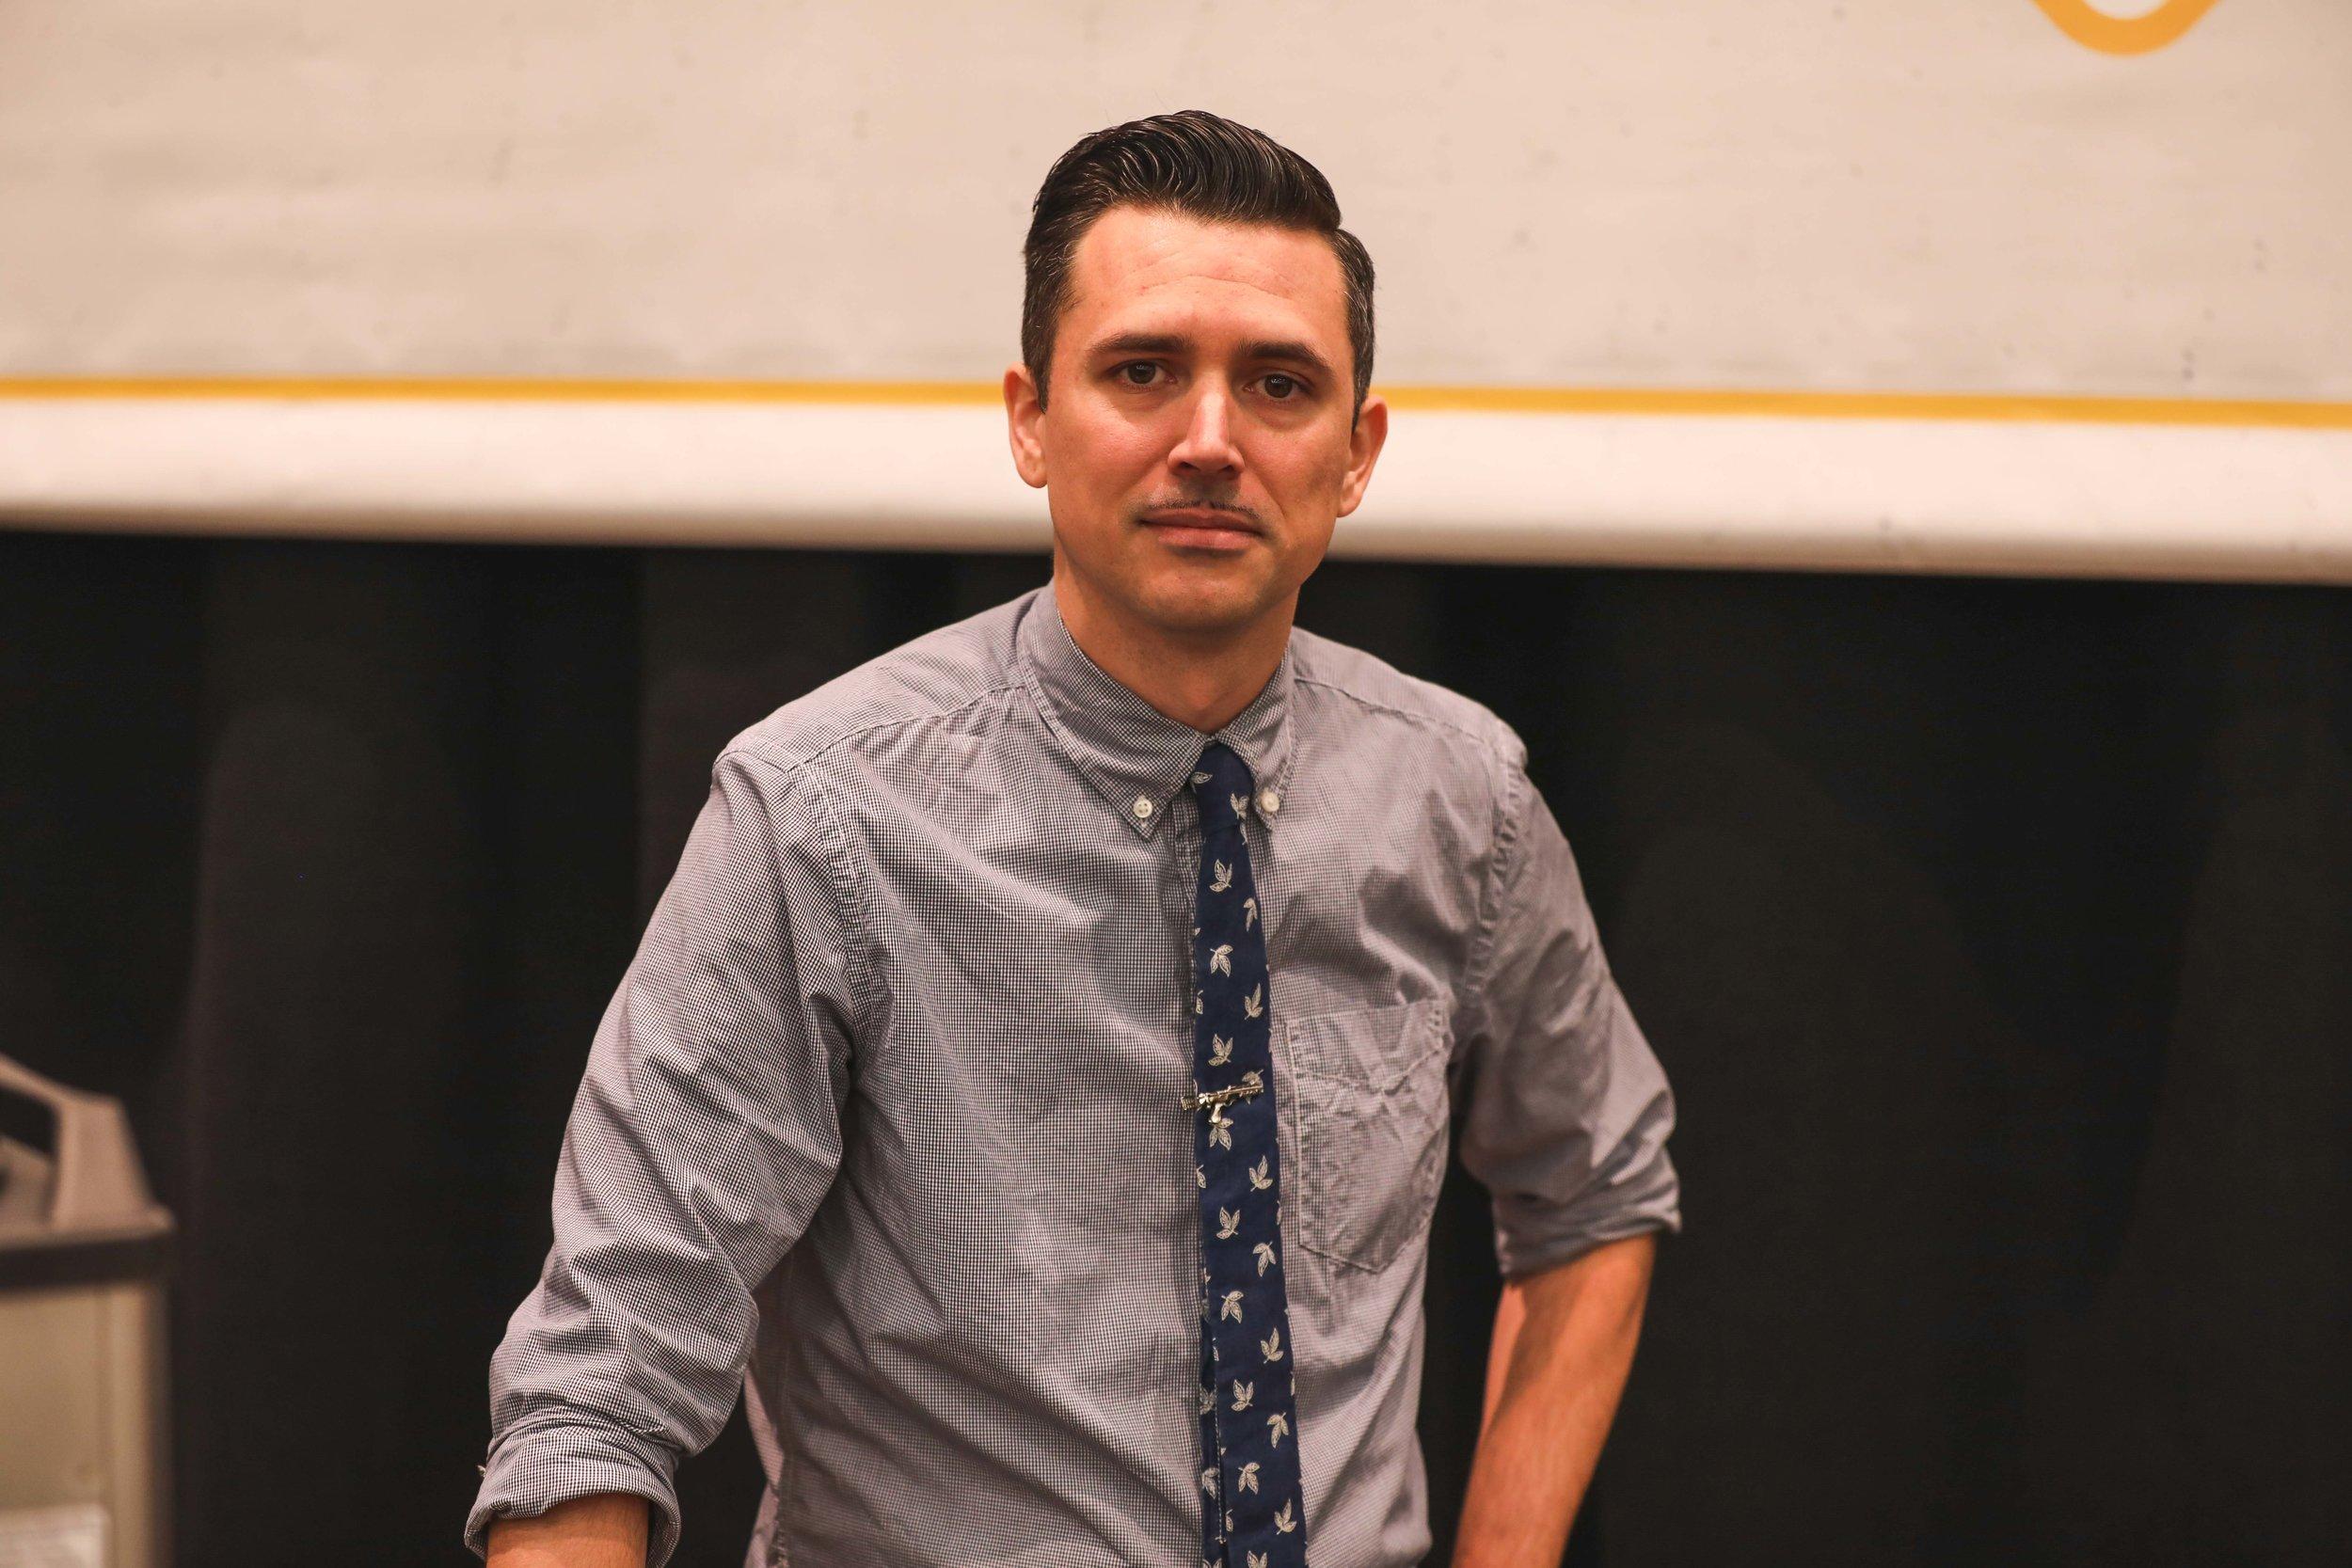 Ian Picco, Lead